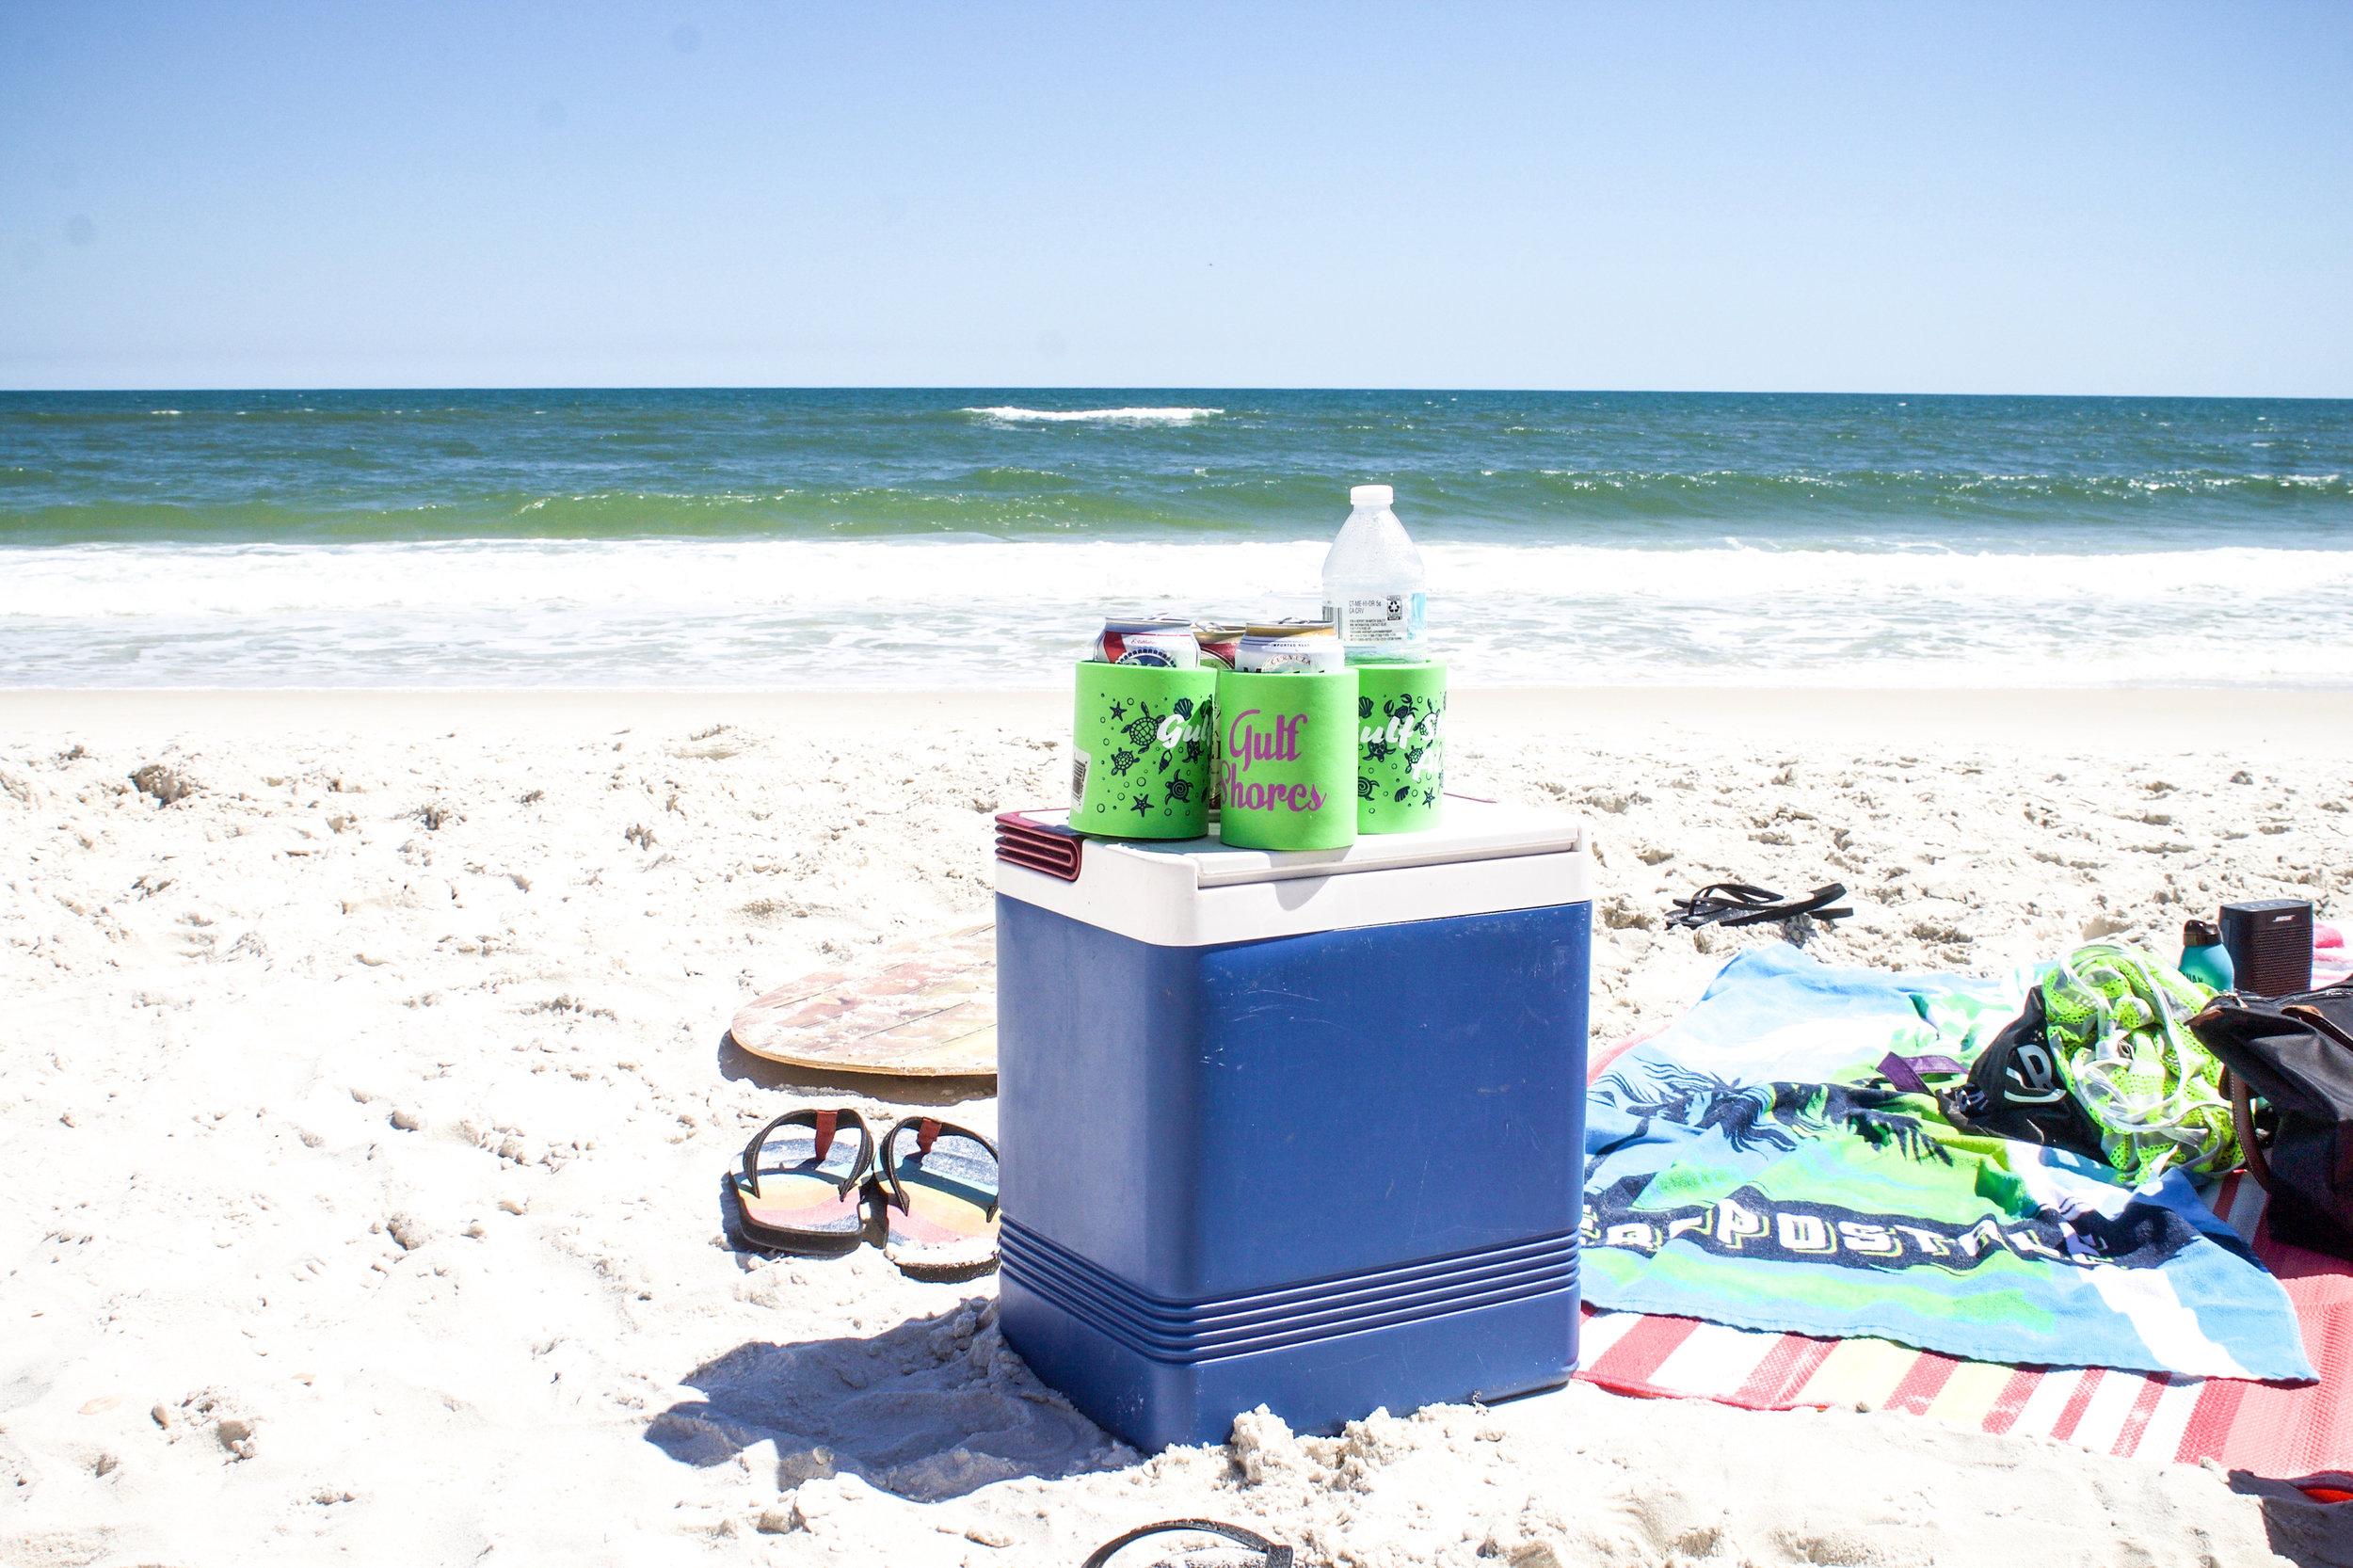 Gulf shores 20.jpg